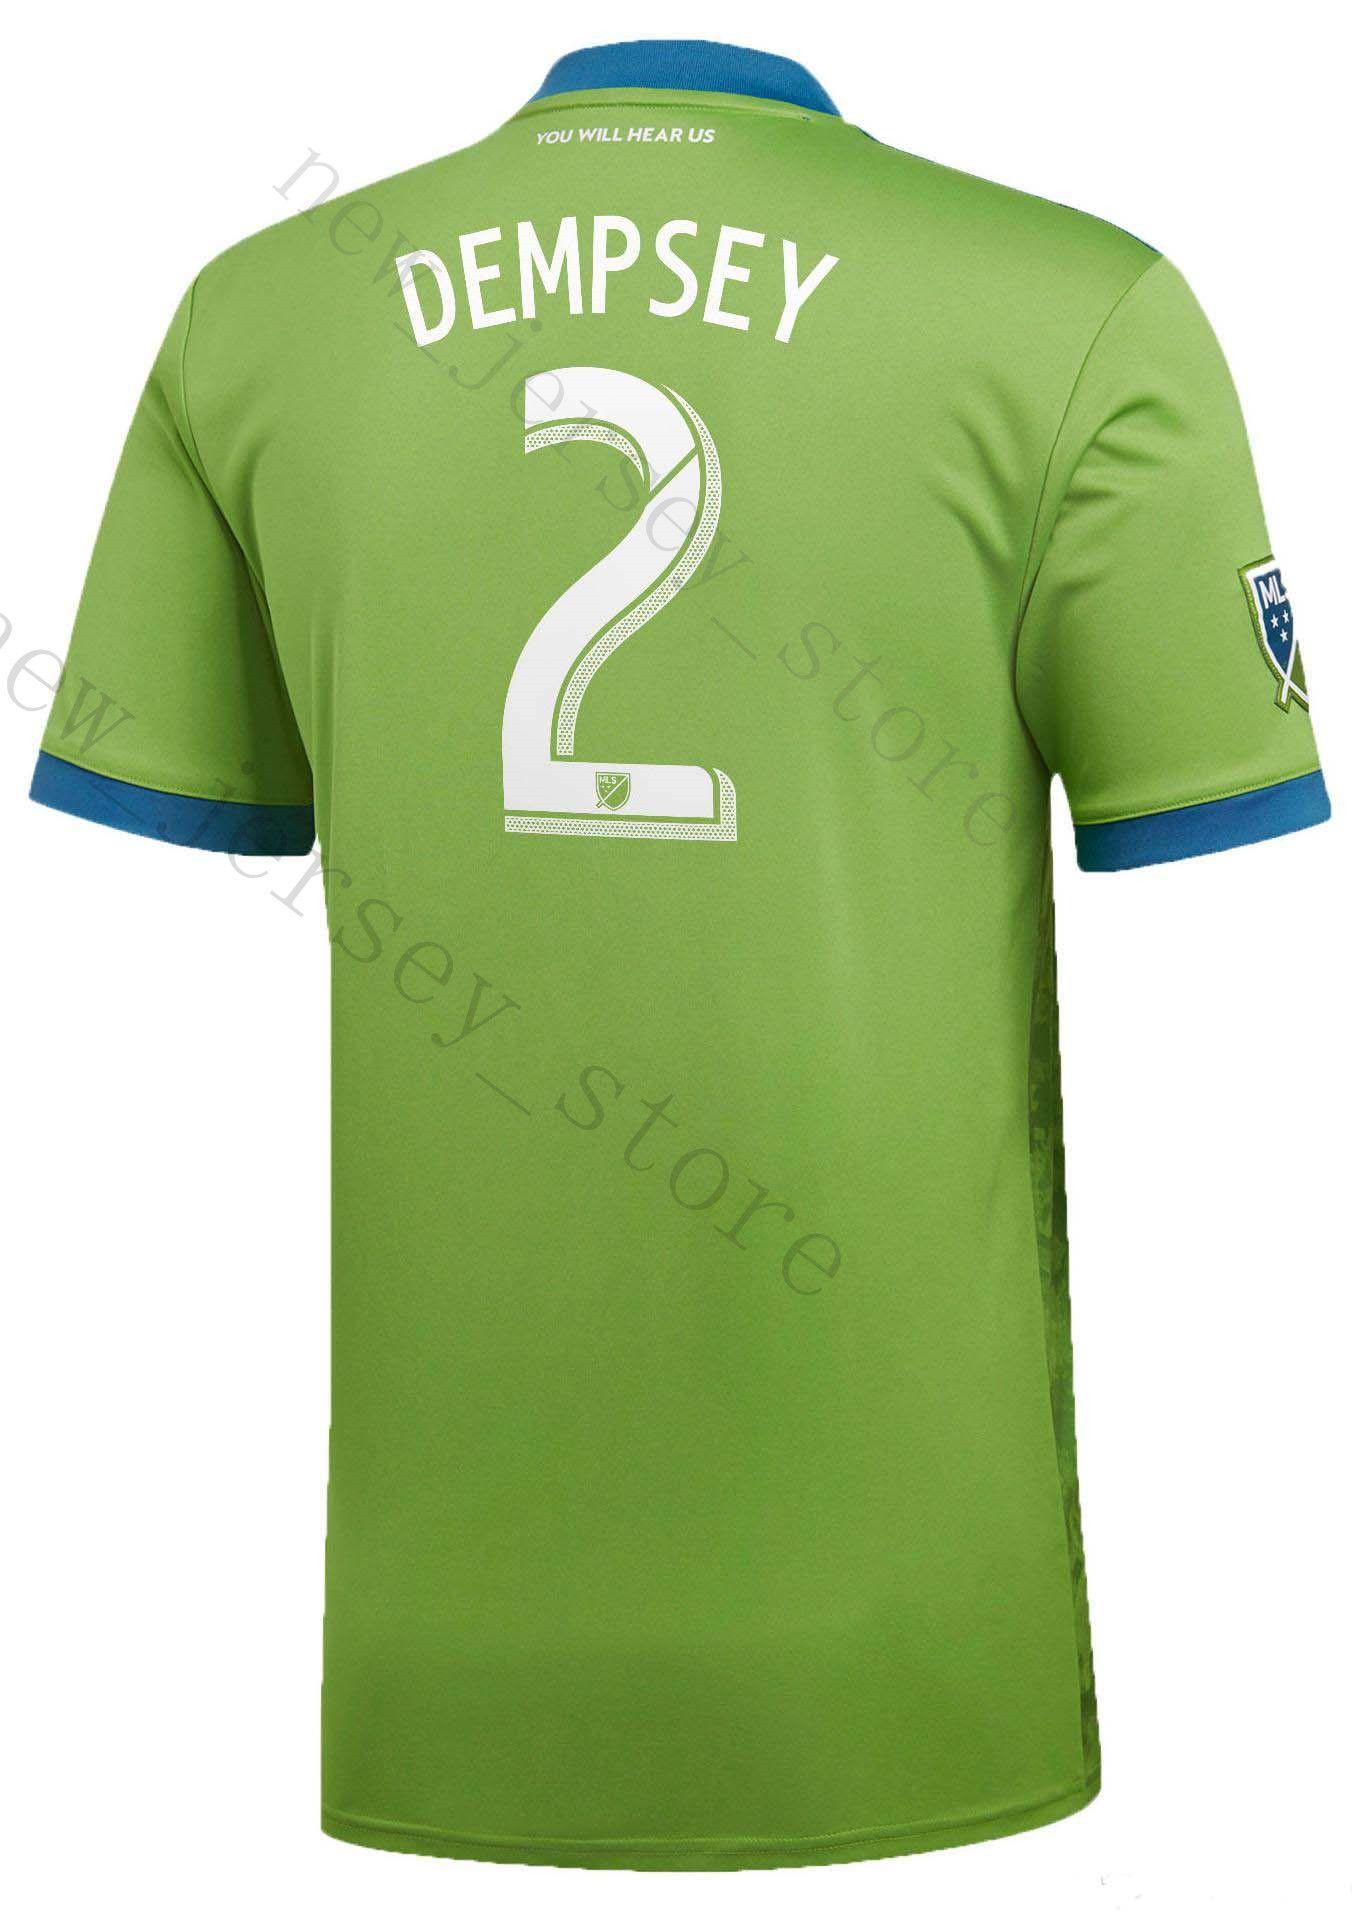 c8ba2bd4f 18 19 Seattle Sounders FC Soccer Jerseys 2 DEMPSEY 13 MORRIS 10 LODEIRO  MARTINS ALONSO 29 TORRES 7 ROLDAN Customize Green Football Shirt UK 2019  From ...